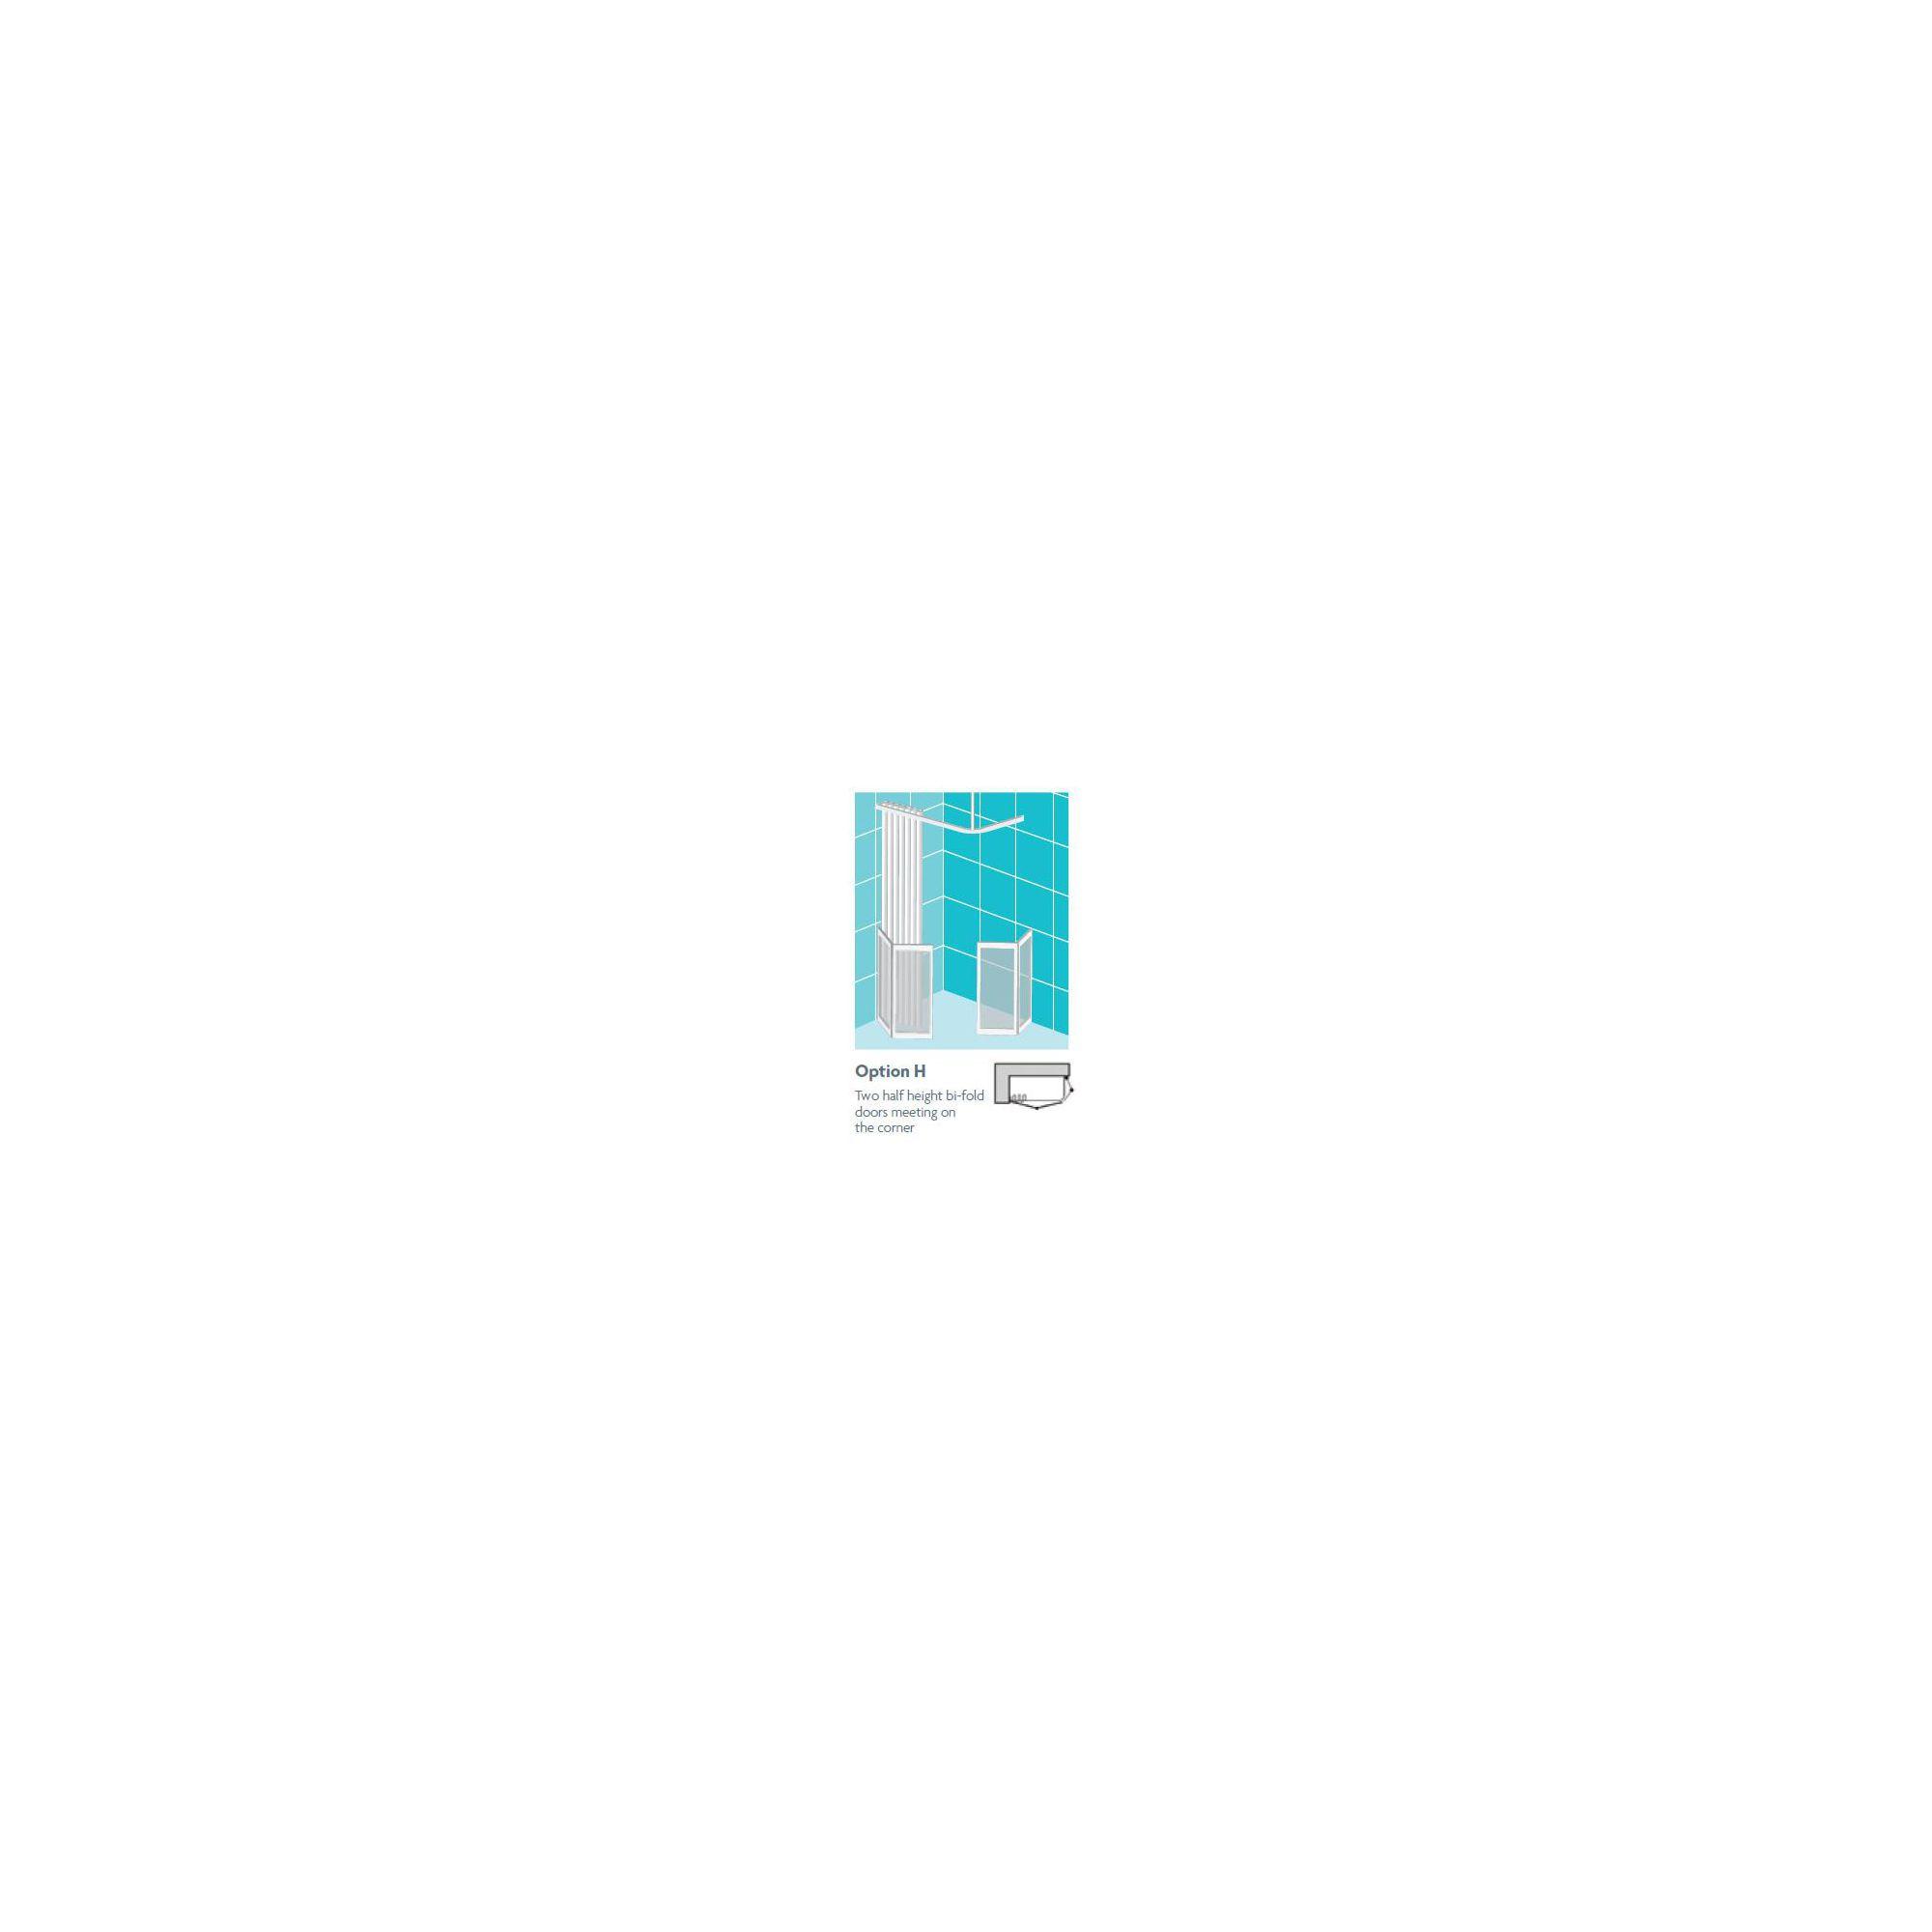 Impey Supreme Corner Door Option H Left Hand 1250mm x 830mm at Tesco Direct